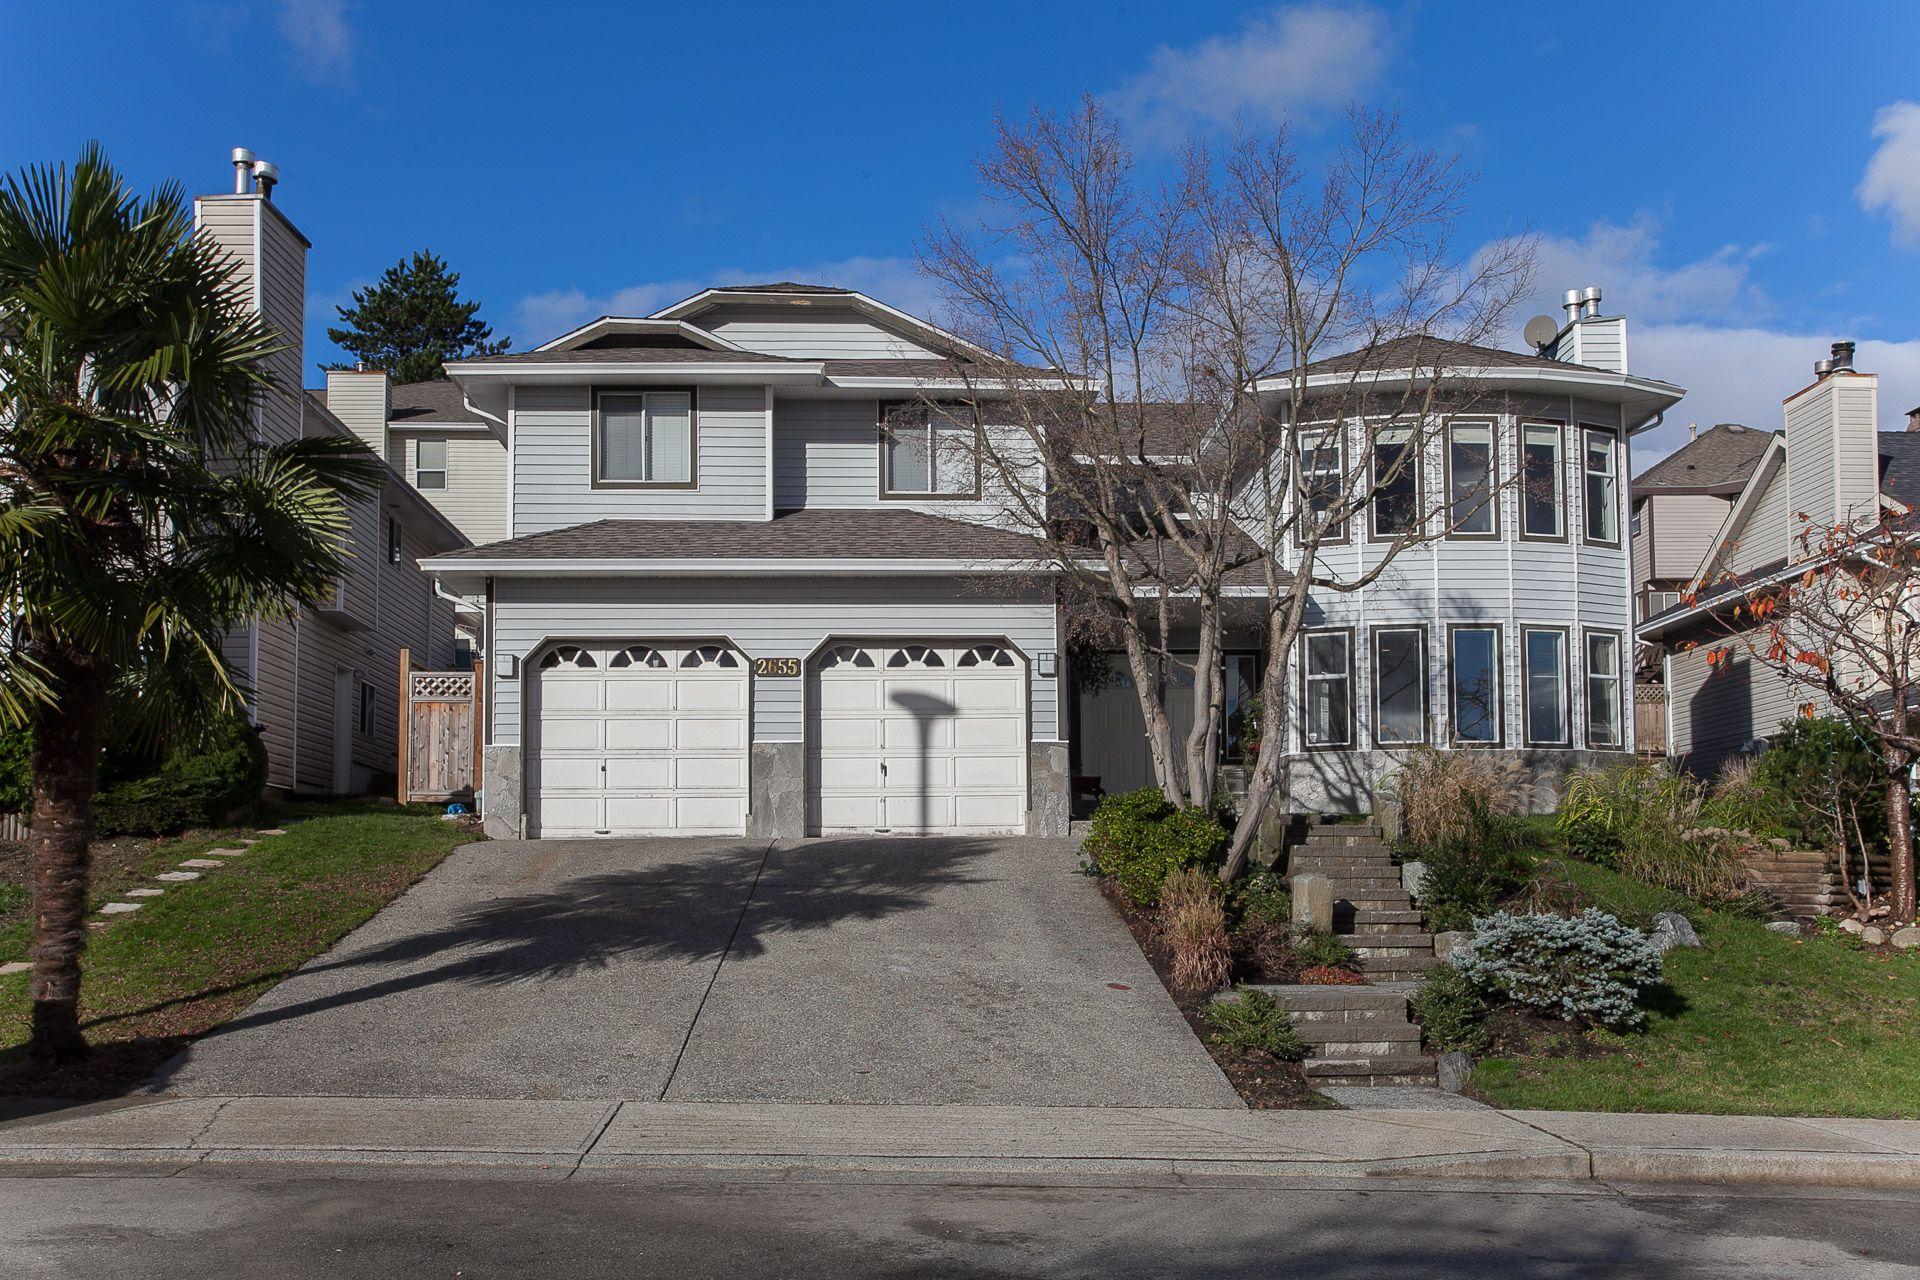 Main Photo: 2655 Delahaye Drive in : Scott Creek House  (Coquitlam)  : MLS®# R2125213